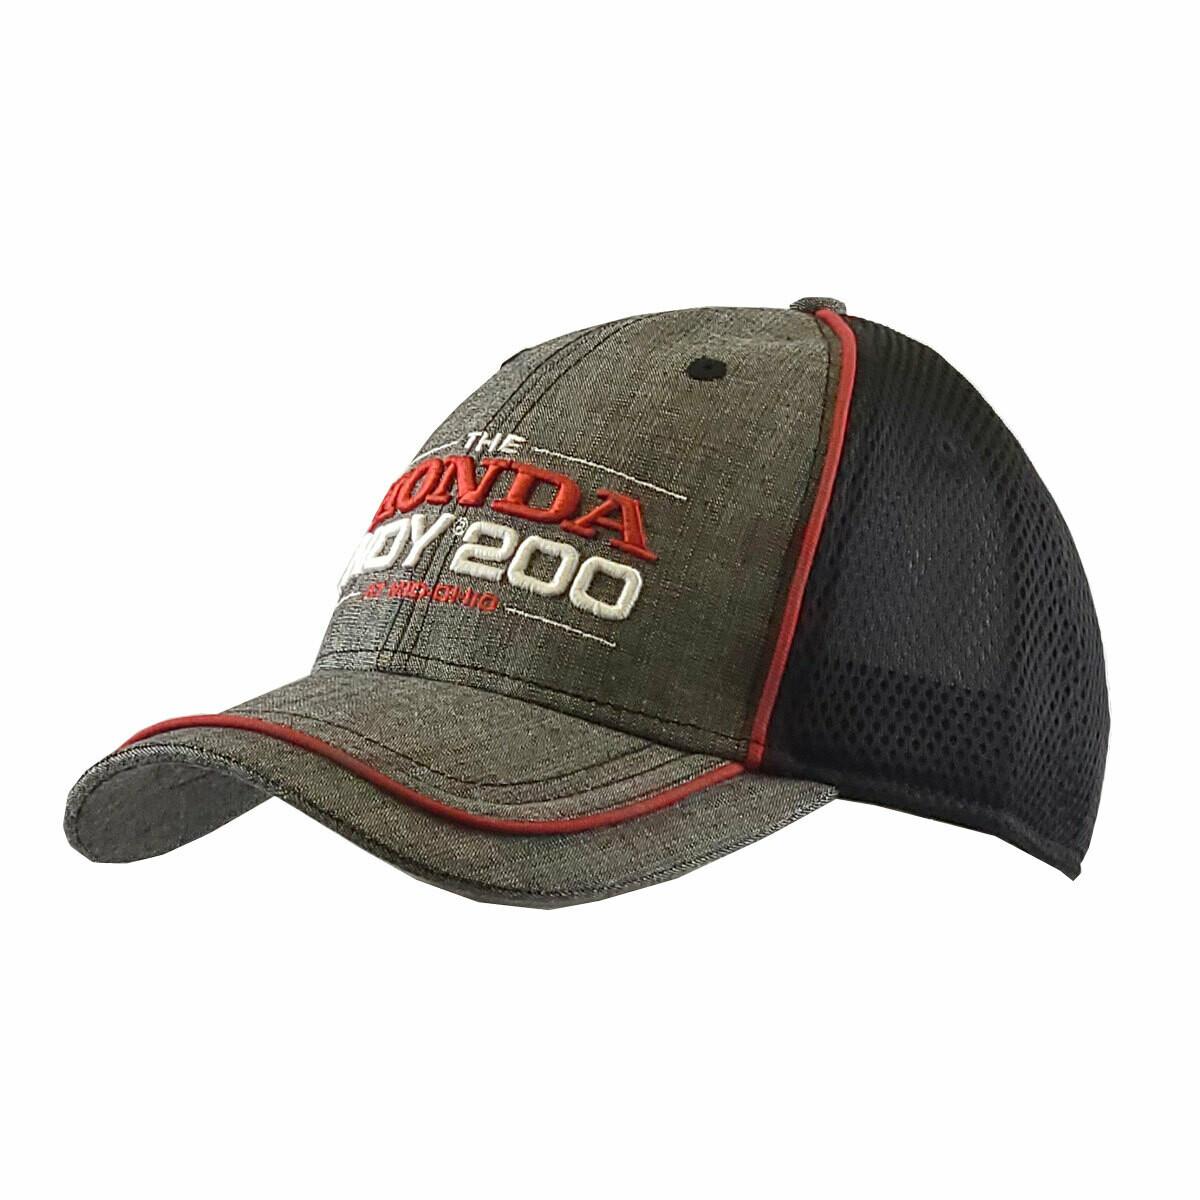 2021 Honda Indy 200 Hat - Chambray/Black